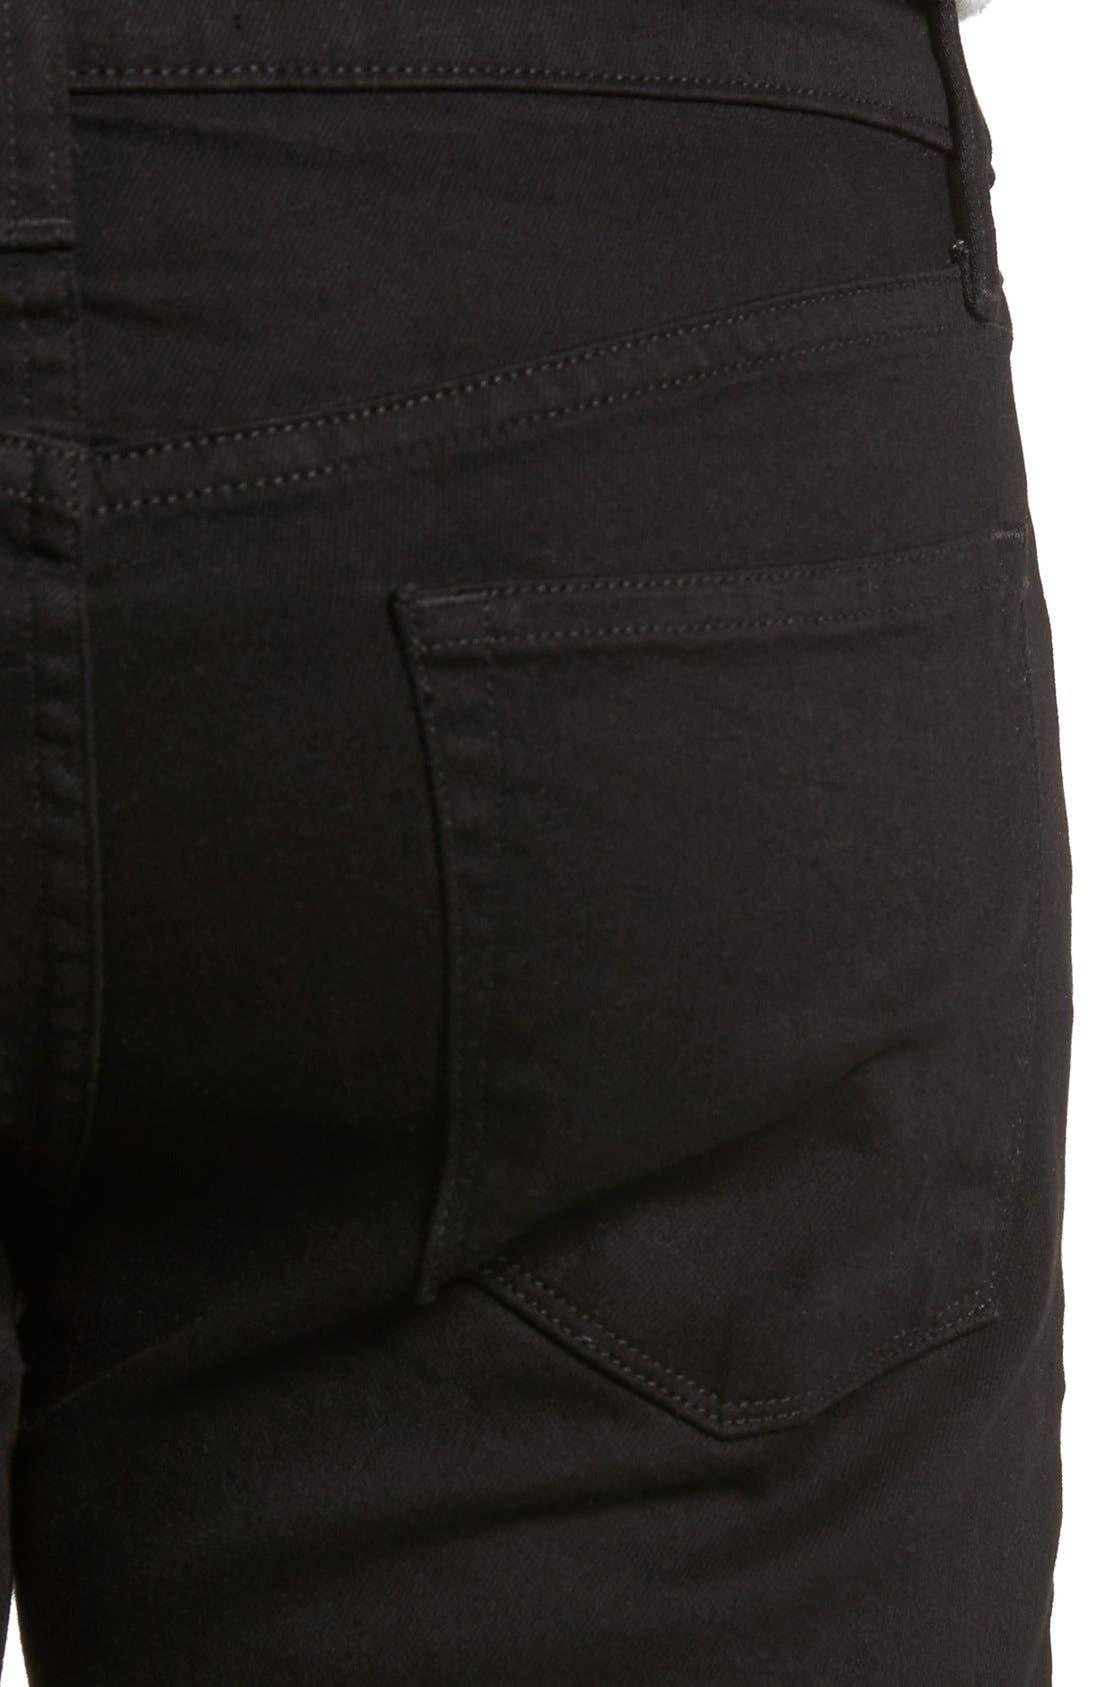 Tyler Slim Fit Jeans,                             Alternate thumbnail 4, color,                             Trivor Black